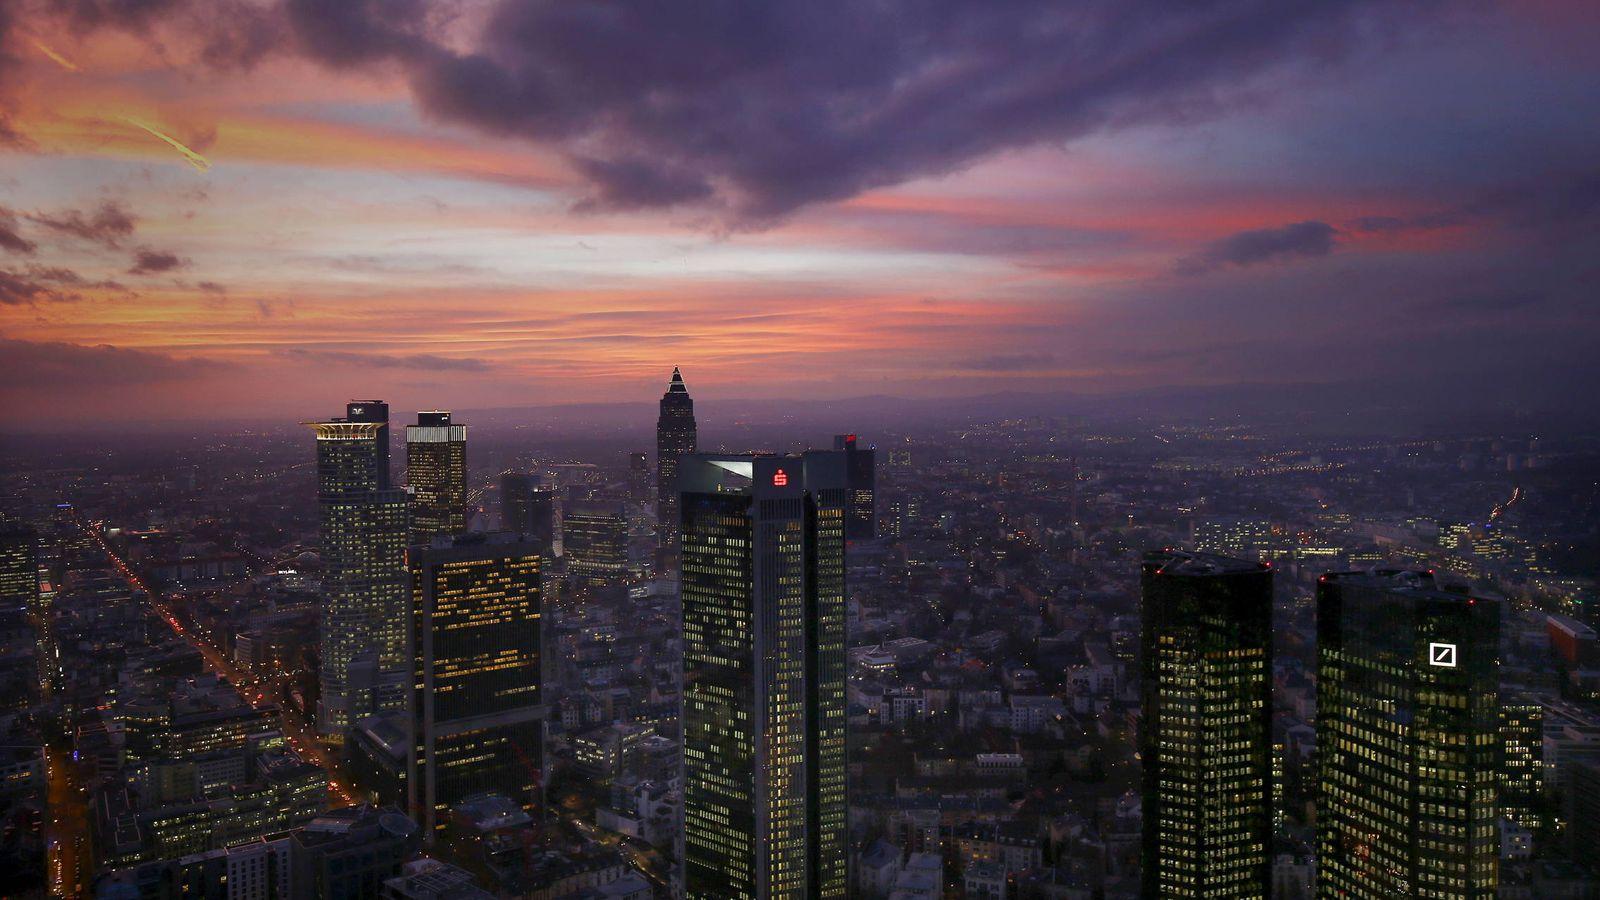 Foto: El skyline del área financiera de Fráncfort, la capital financiera alemana. (Reuters)